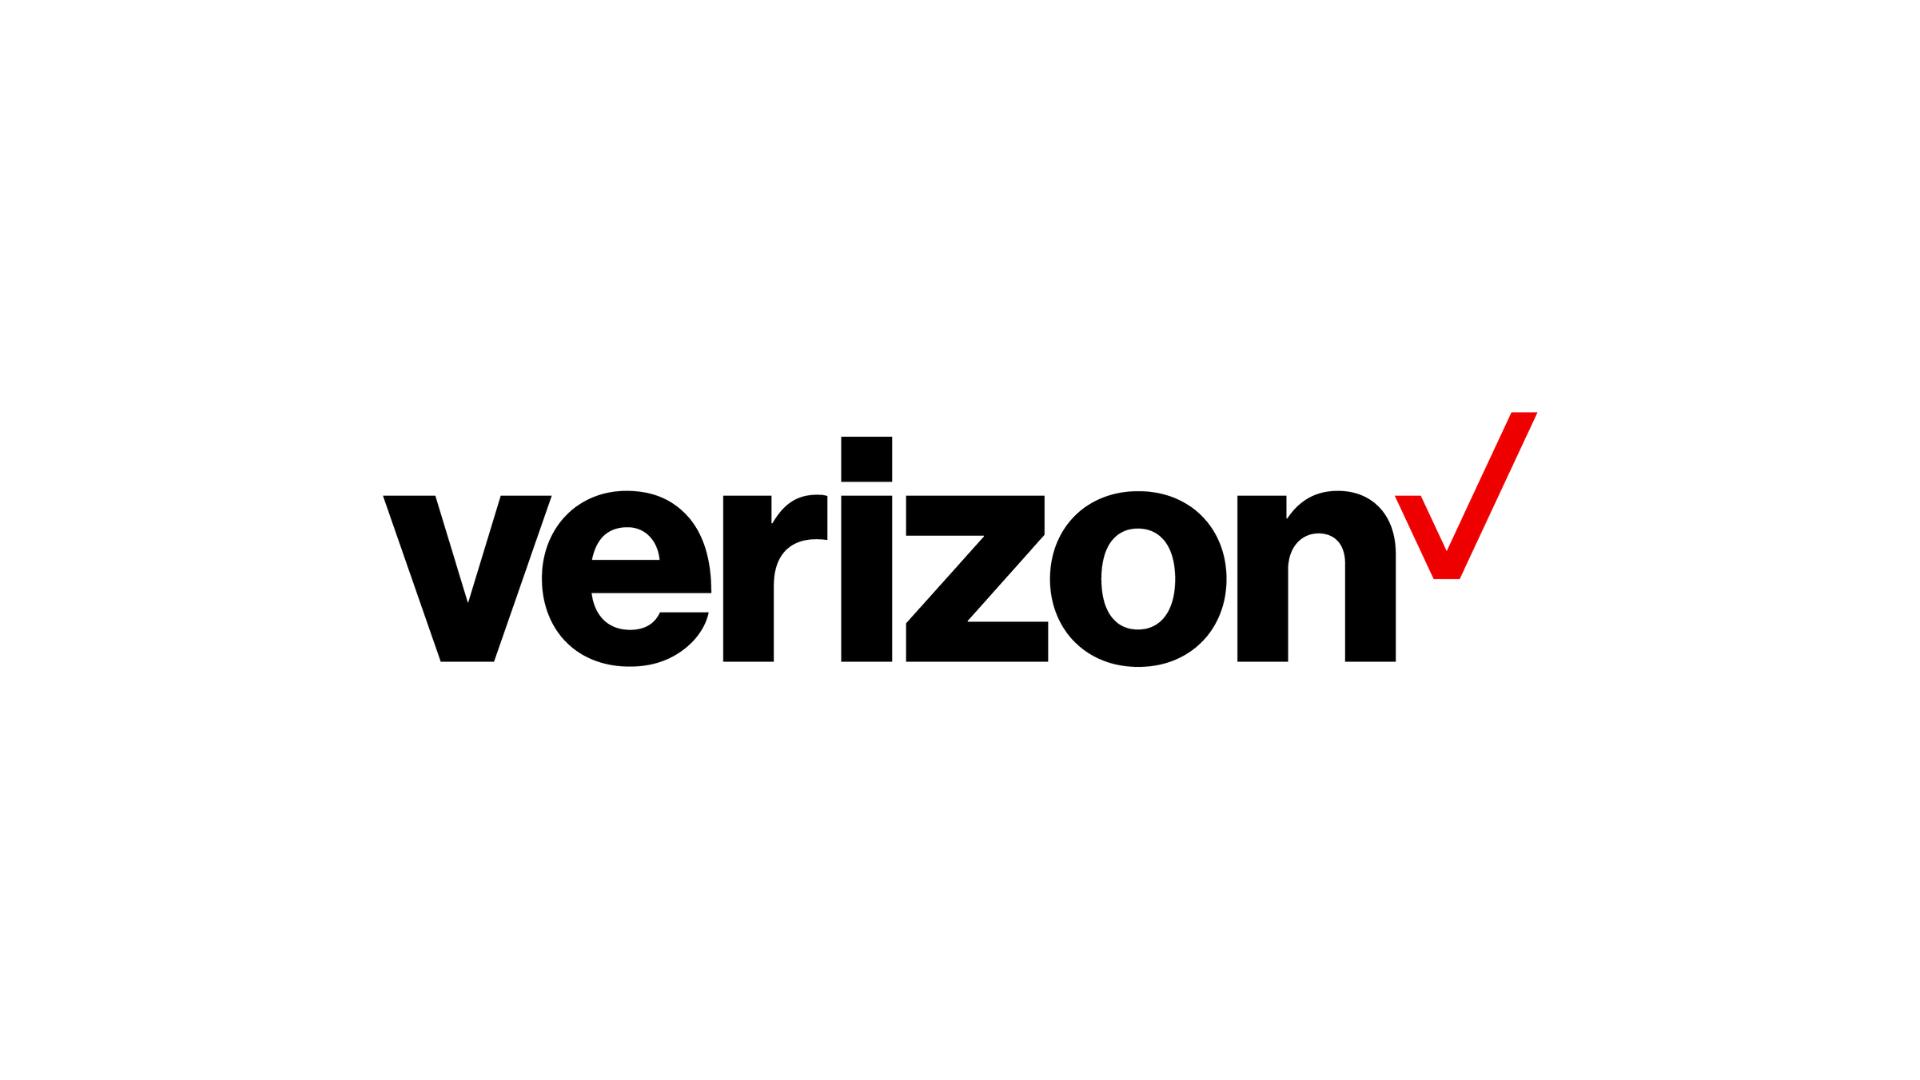 Verizon: Raising awareness of emerging Internet-of-Things solutions.